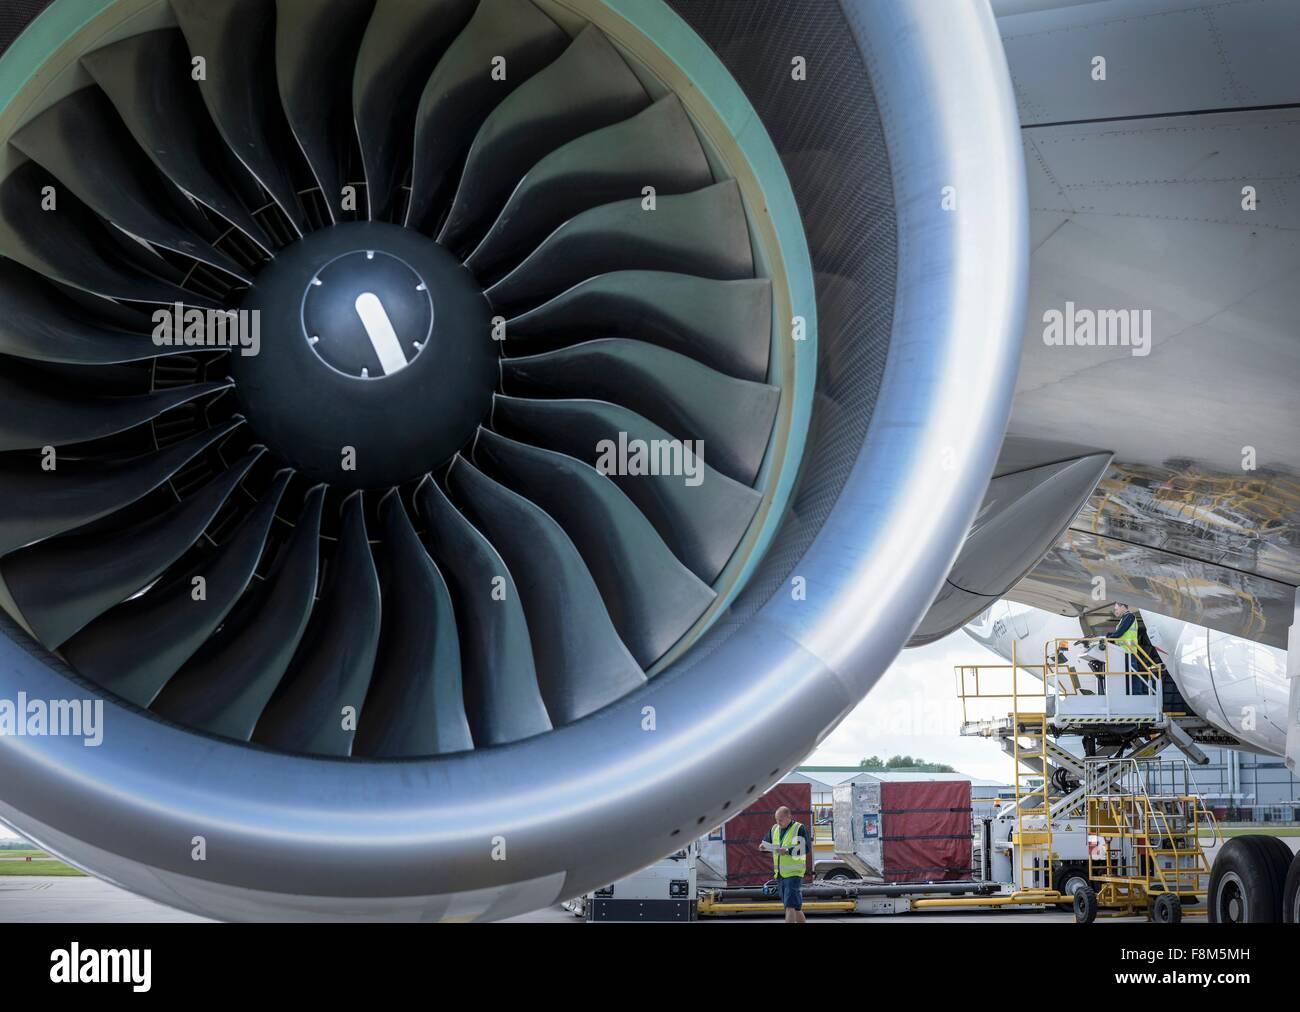 Close up de jet turbine sur A380 Photo Stock